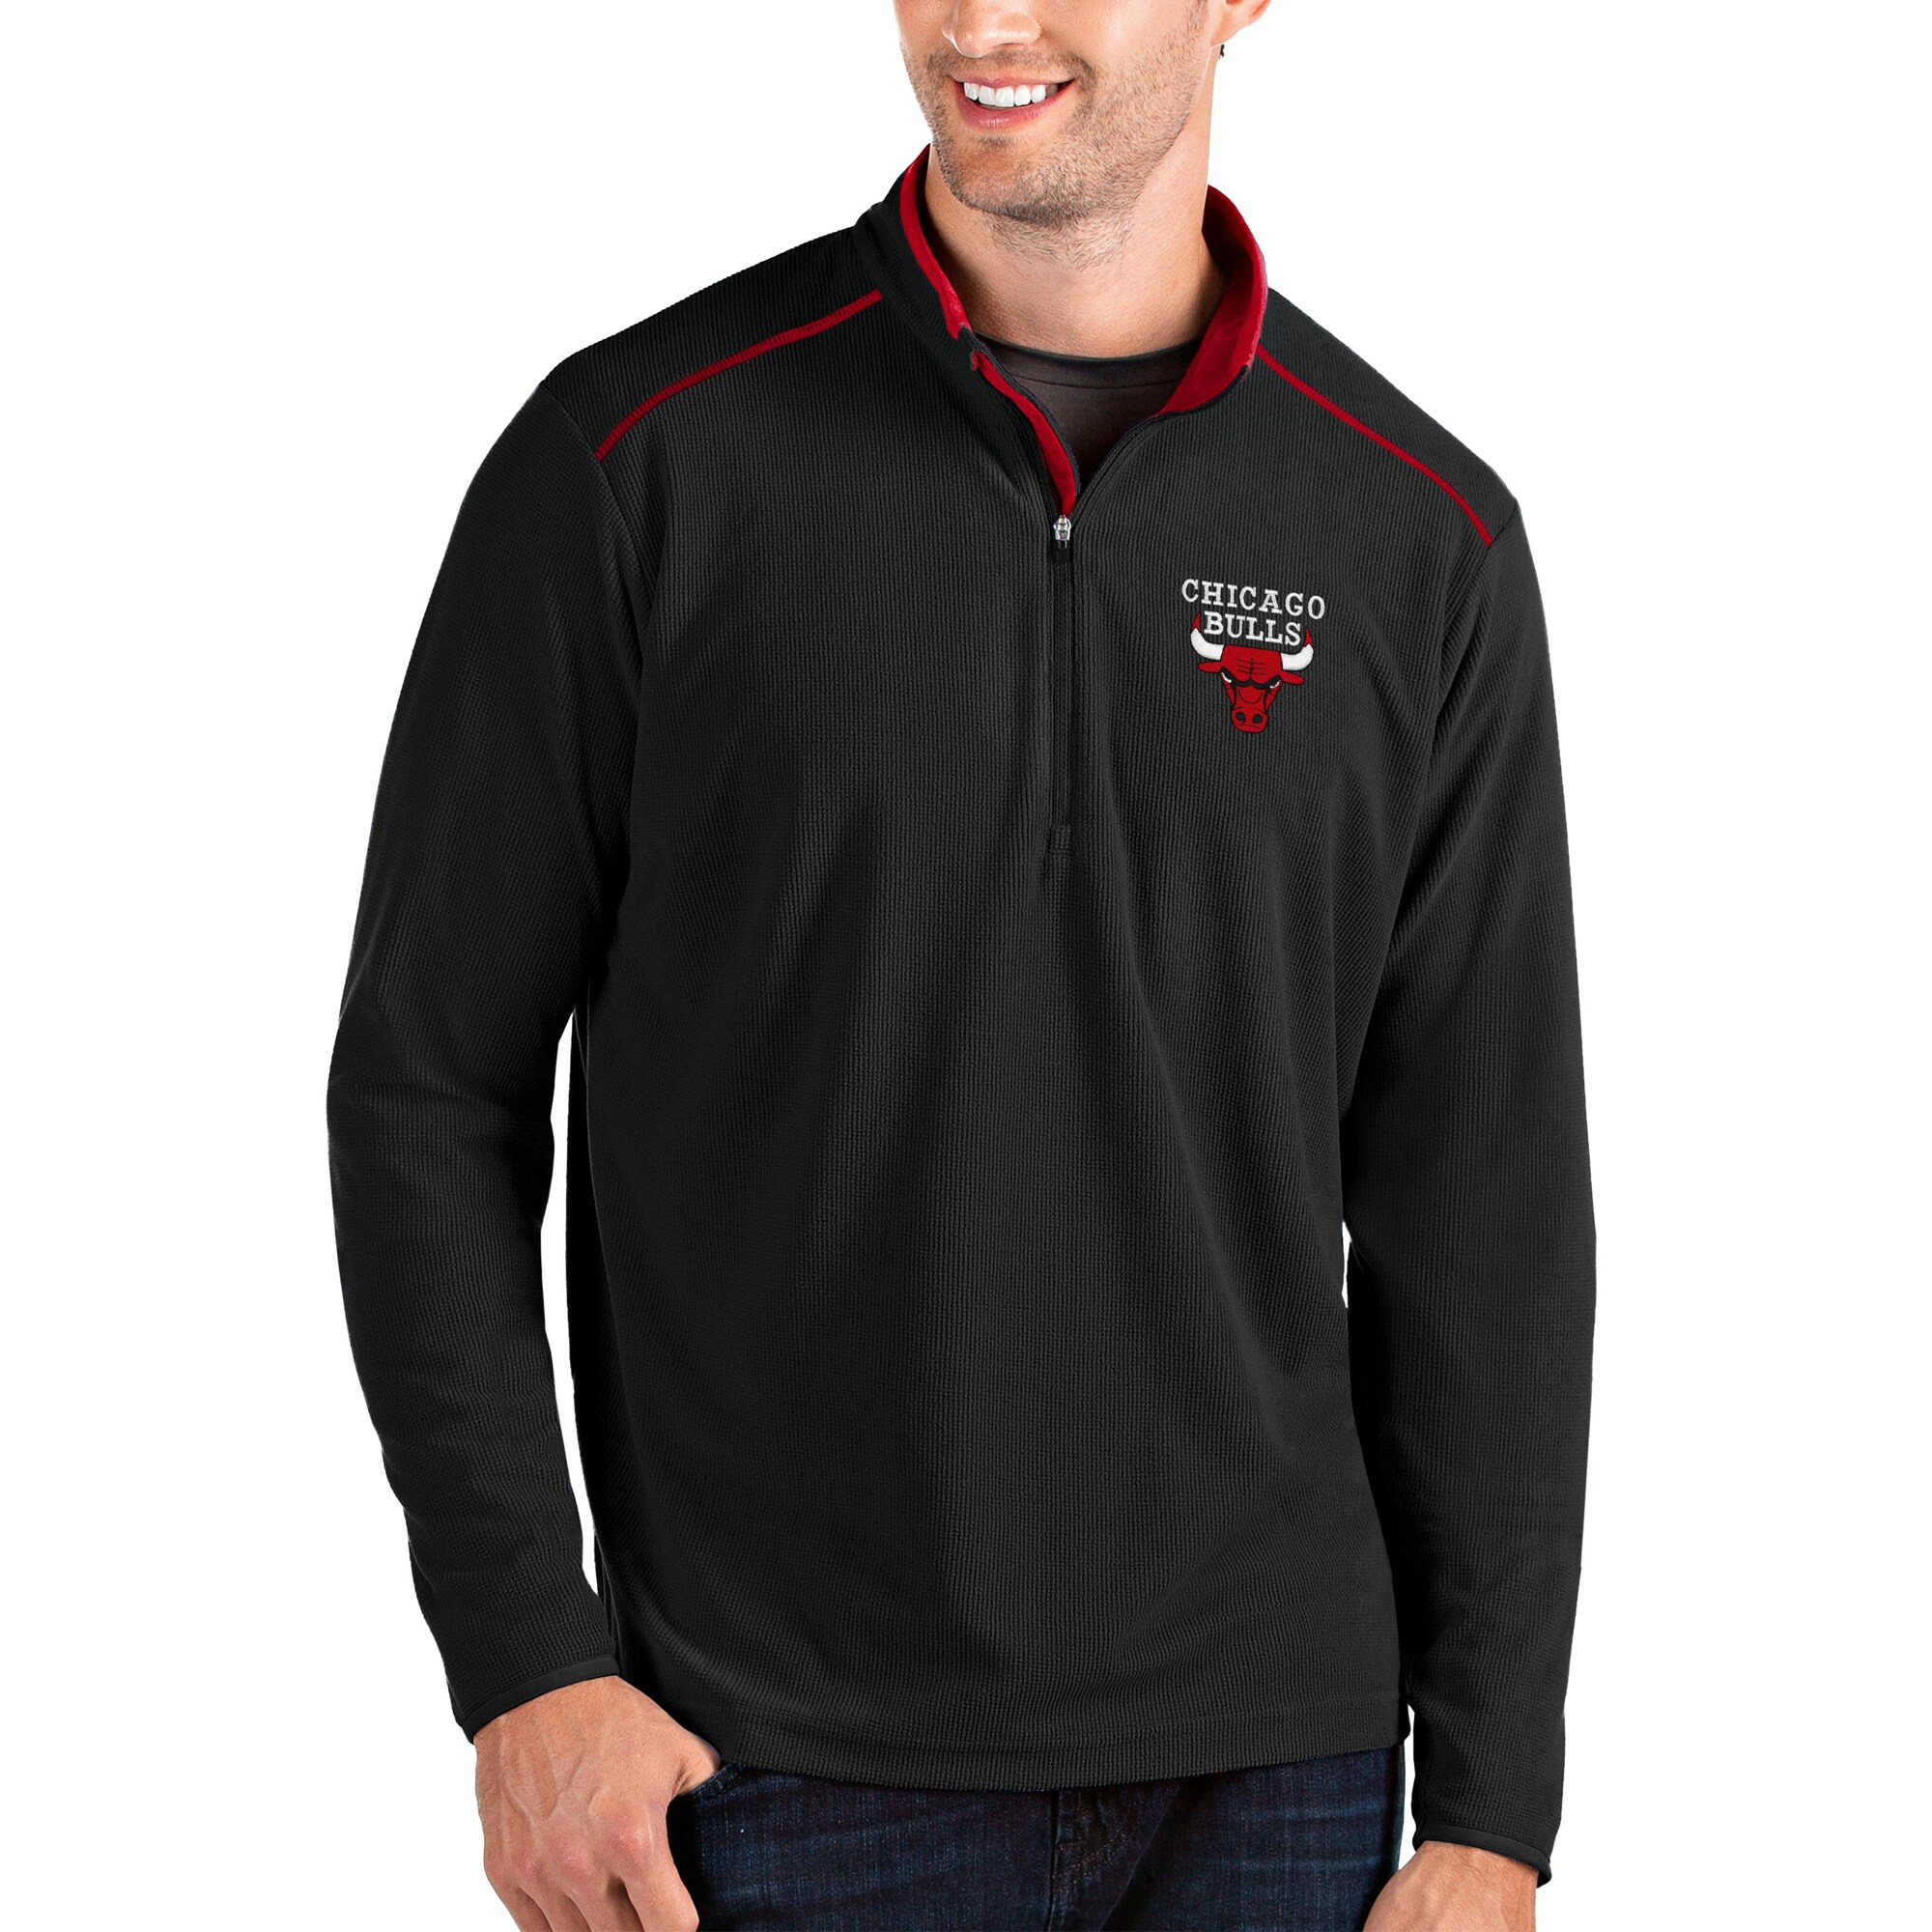 Chicago Bulls Antigua Glacier Quarter-Zip Pullover Jacket - Black/Red